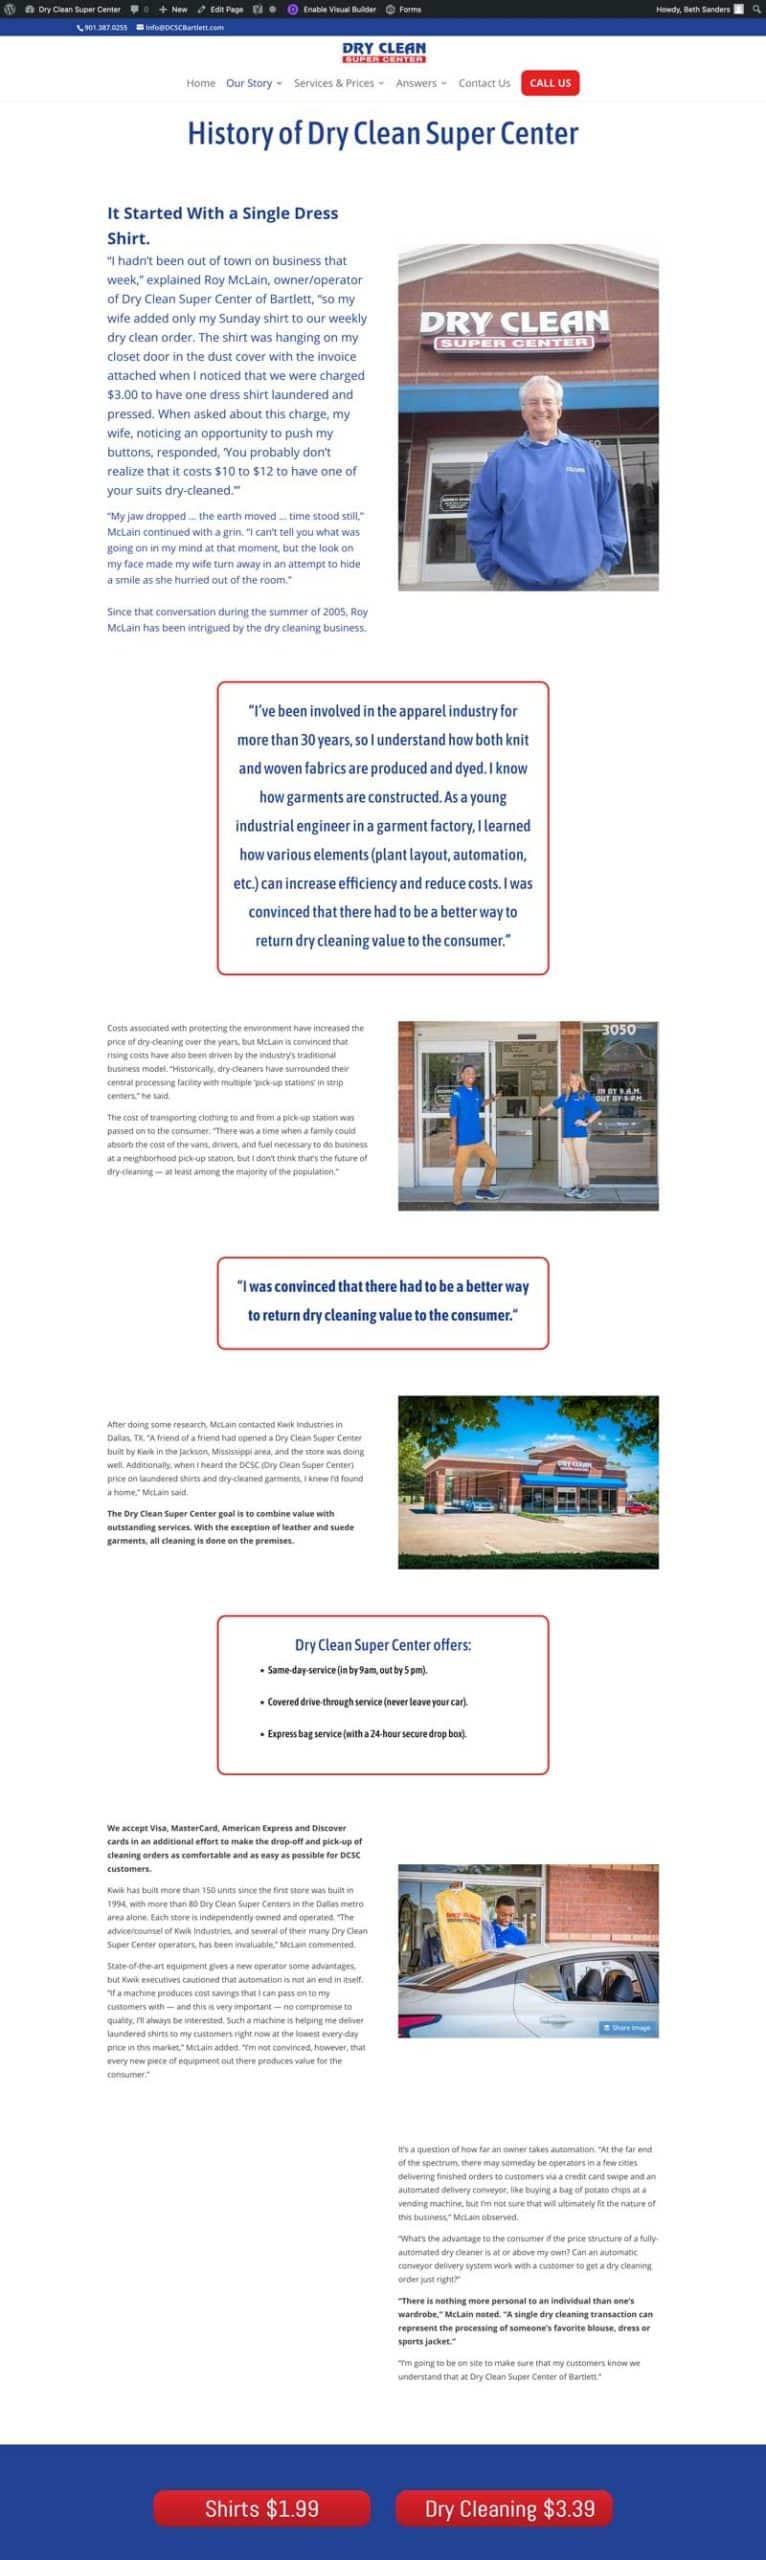 dry cleaner website